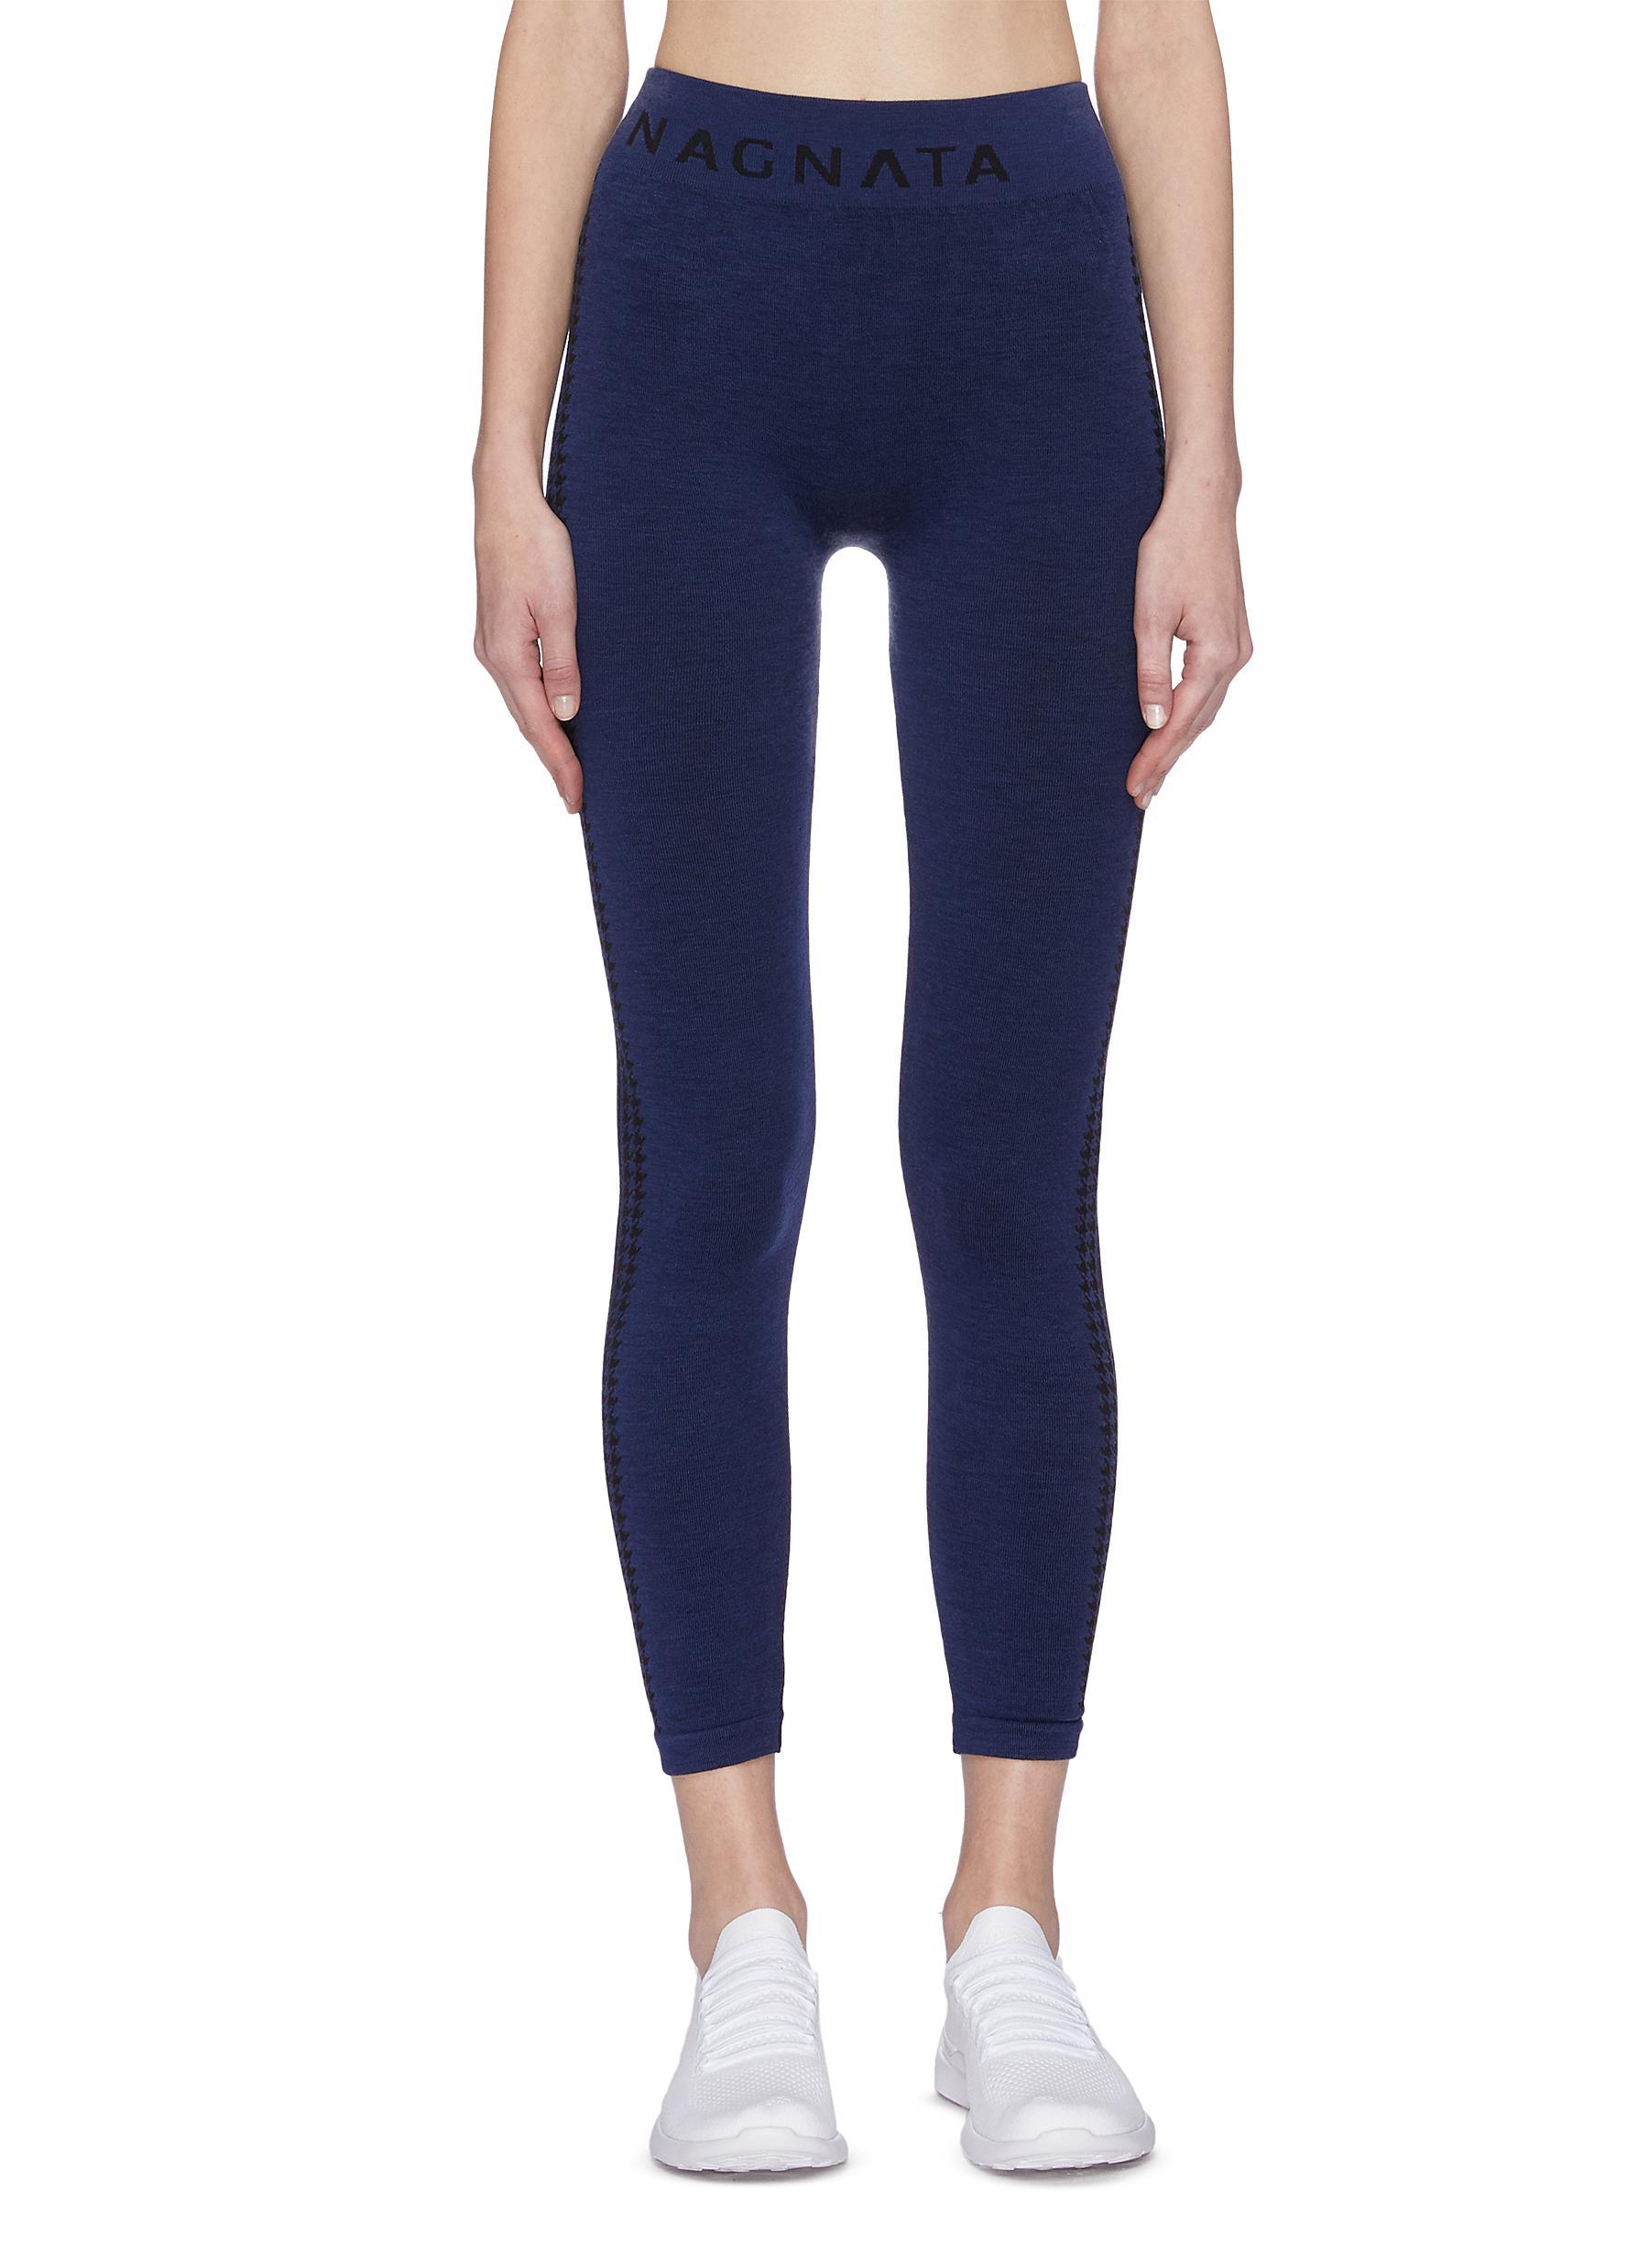 shop Nagnata 'Laya' houndstooth check jacquard stripe outseam performance leggings online